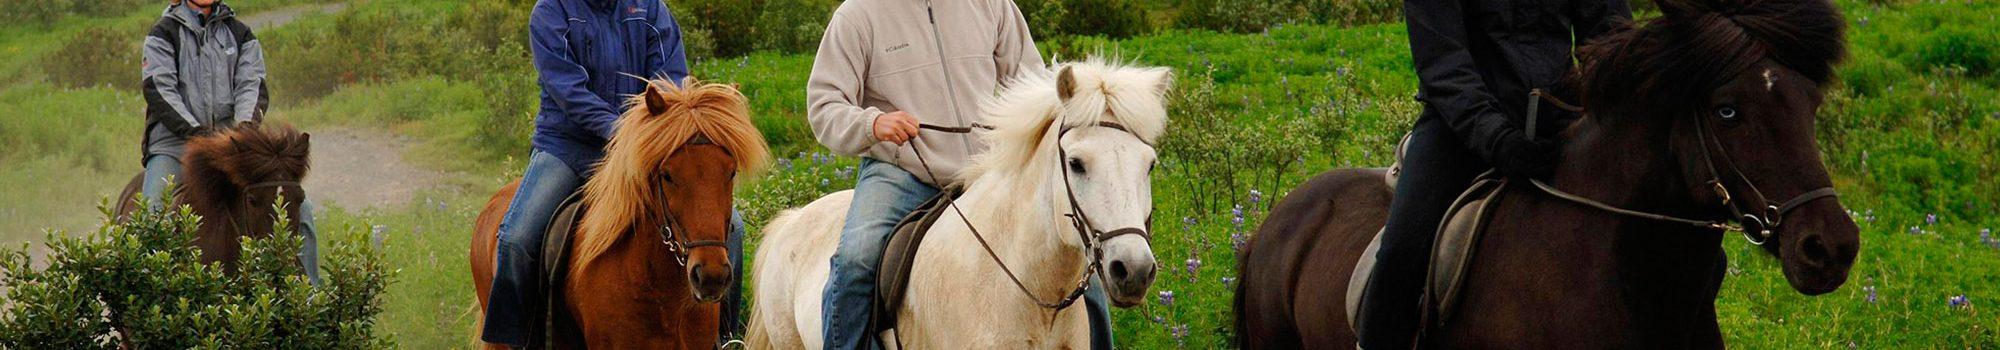 Horse-riding-tour-Iceland